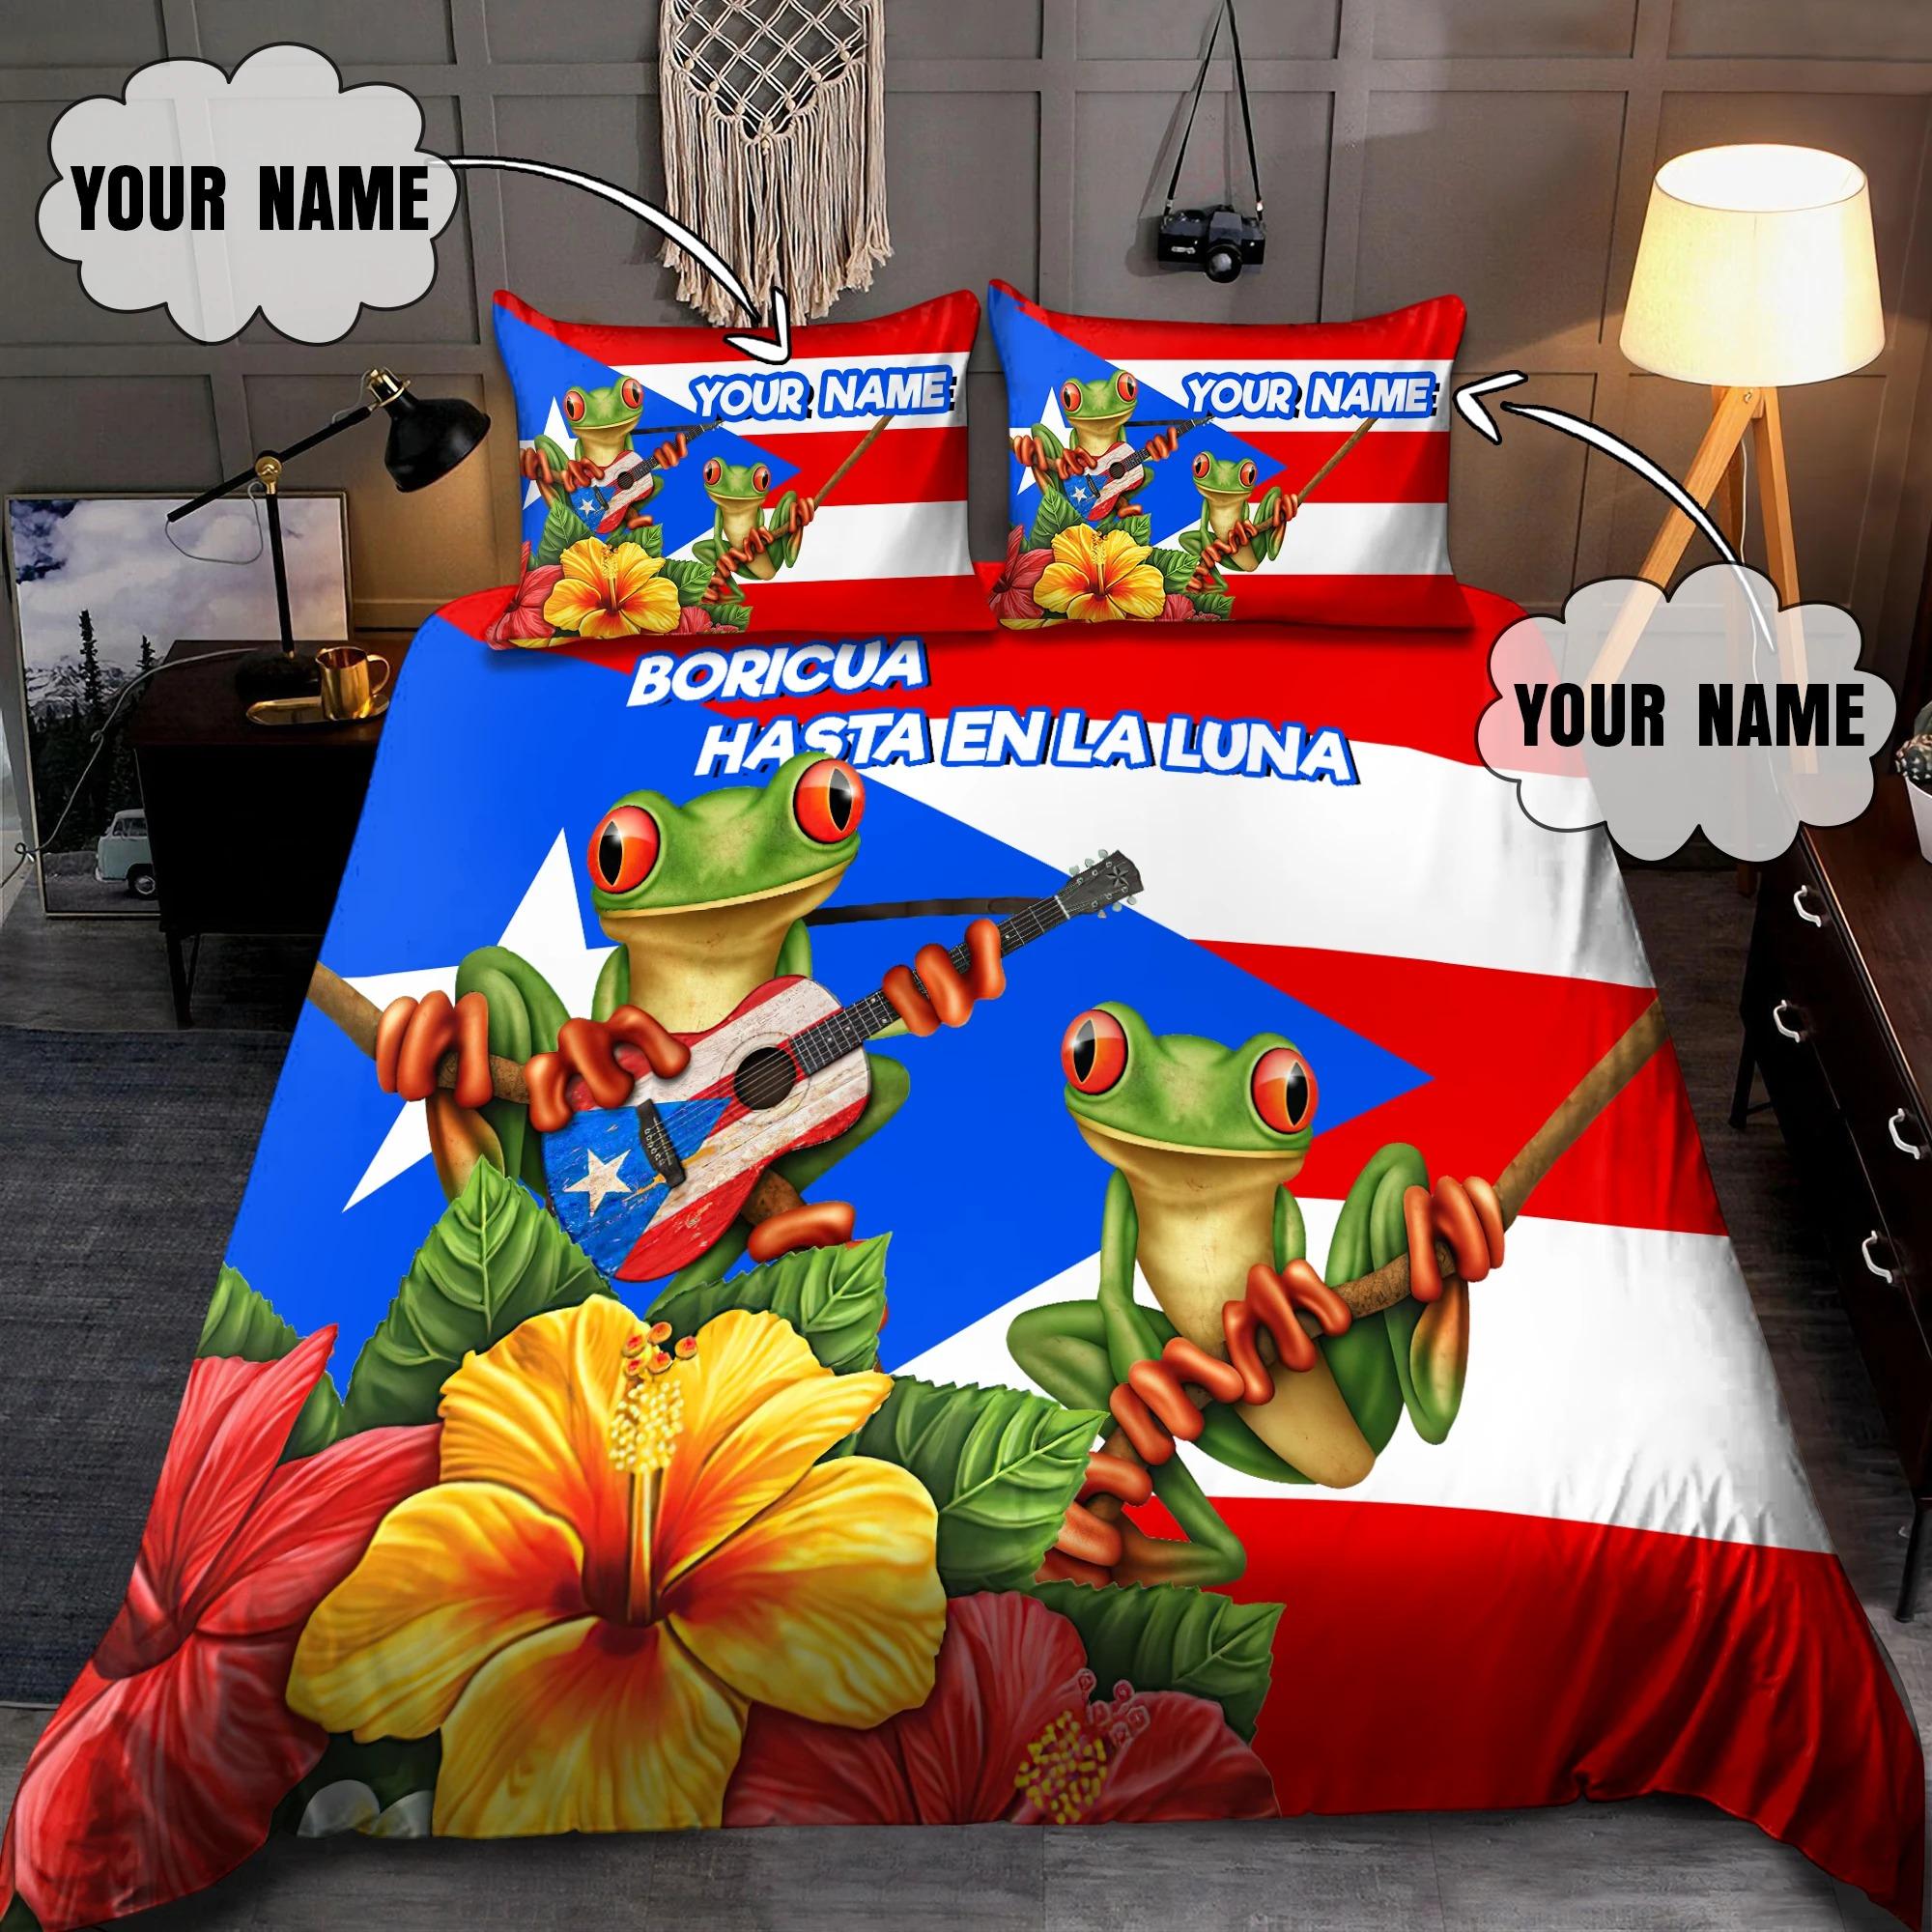 Puerto rico boricua hasta enla luna custom name bedding set2